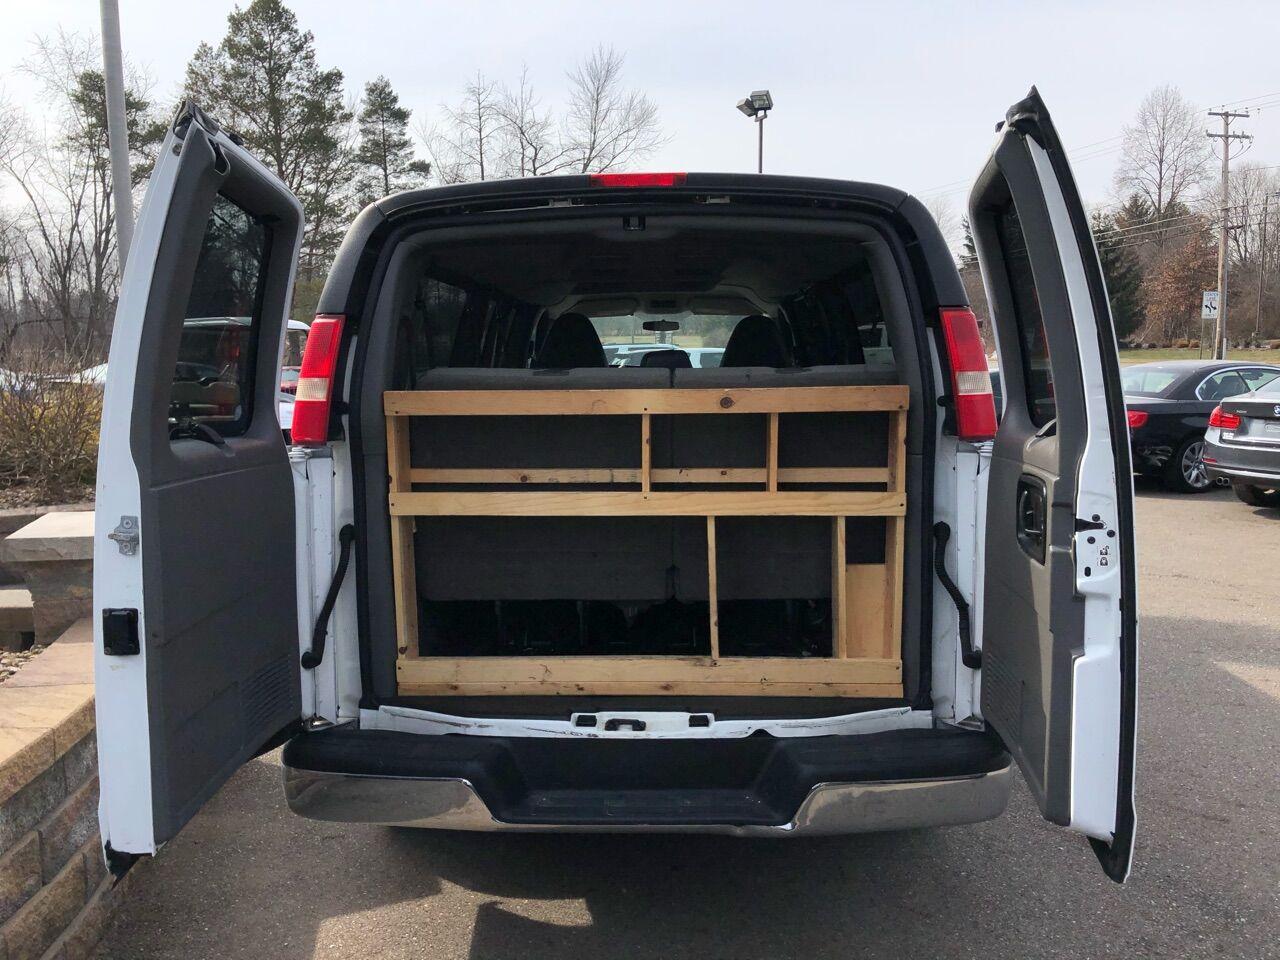 2012 GMC Savana Passenger Full-size Passenger Van